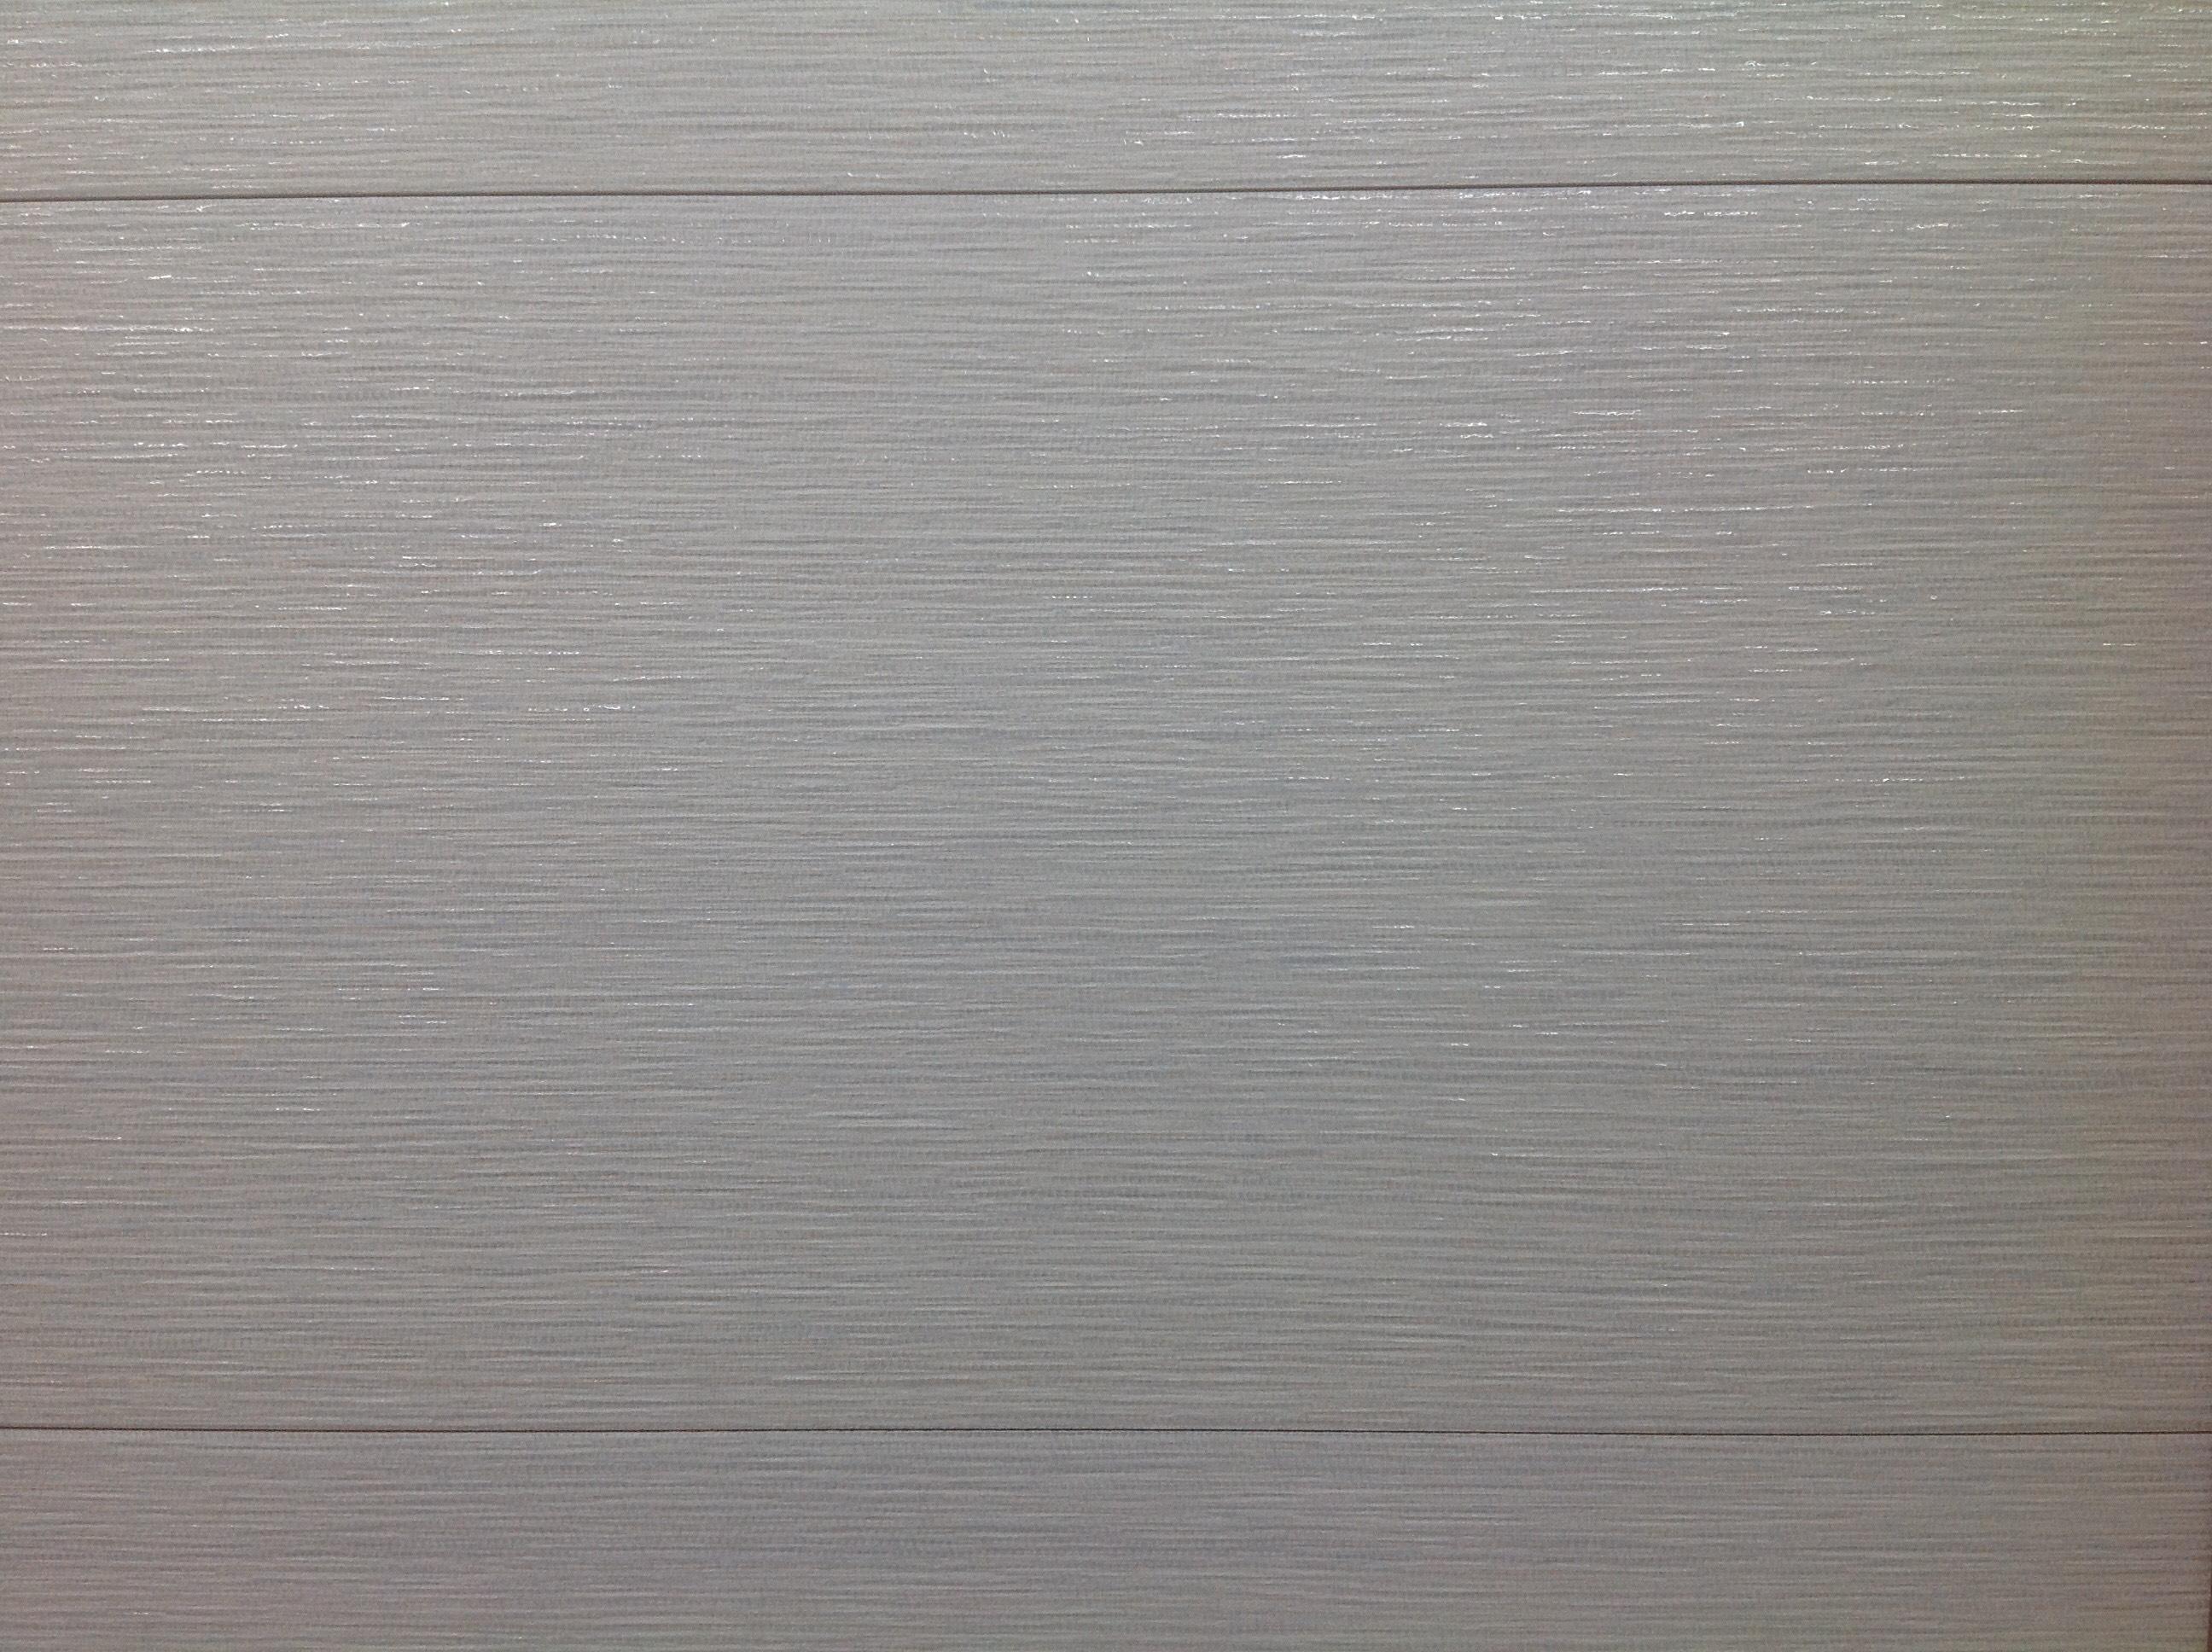 New porcelanosa range the stone tile emporium 3 4 5 dailygadgetfo Image collections